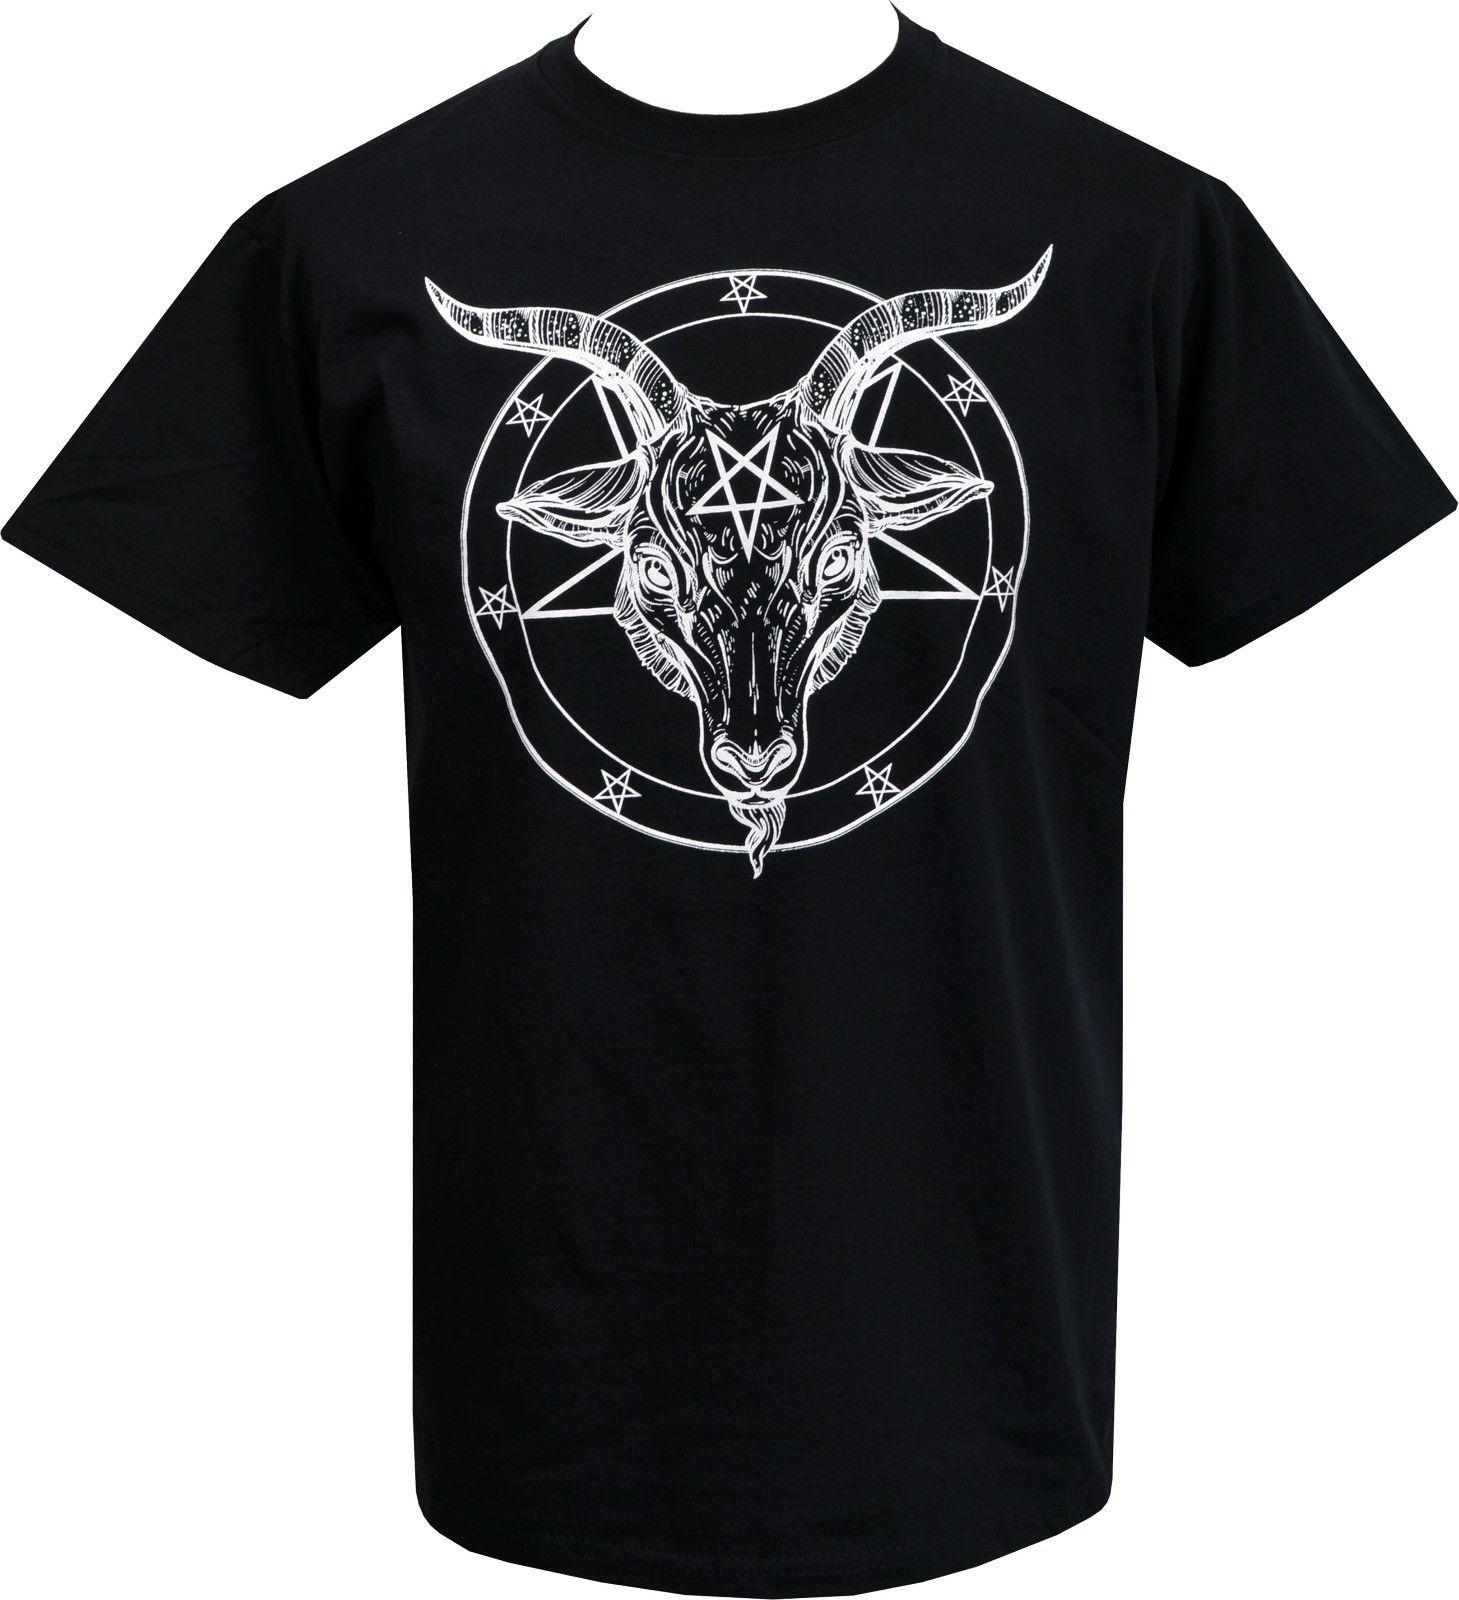 Tops & Tees Humorous Mens T Shirt Baphomet Pentagram Satantic Occult Church Of Satan Goat Goth S 3xl Pride Of The Creature T Shirts Top Tee Mild And Mellow Men's Clothing